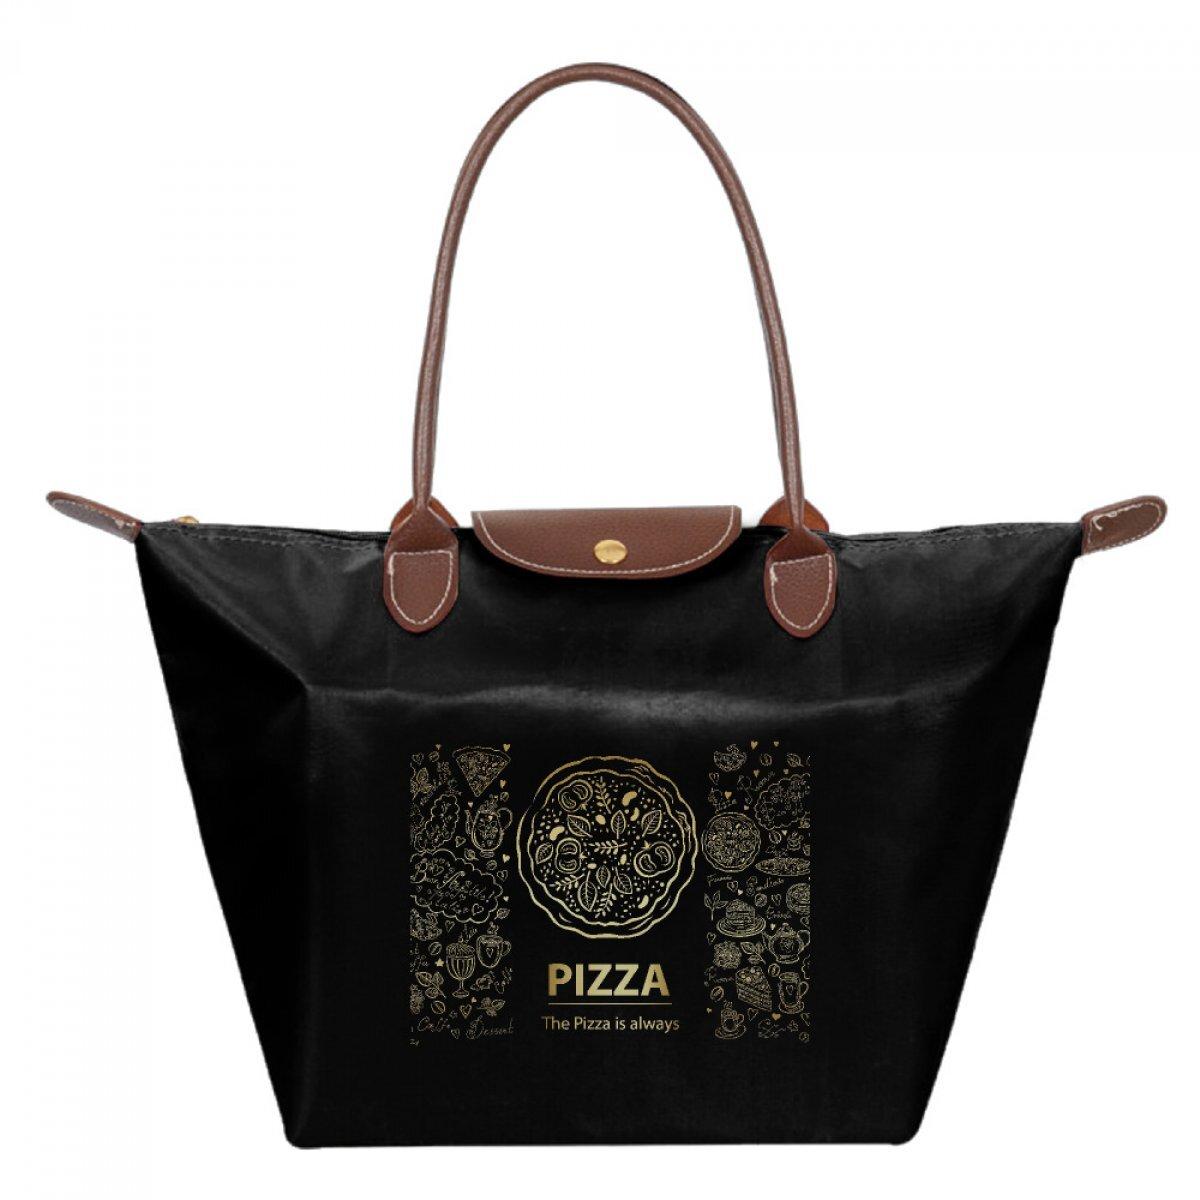 PhoRock Women Foldable Handbag Dumpling Bags Stylish Waterproof Shape Bag Pizza Printed Lady Folding Hobo Bag JZMS002 0